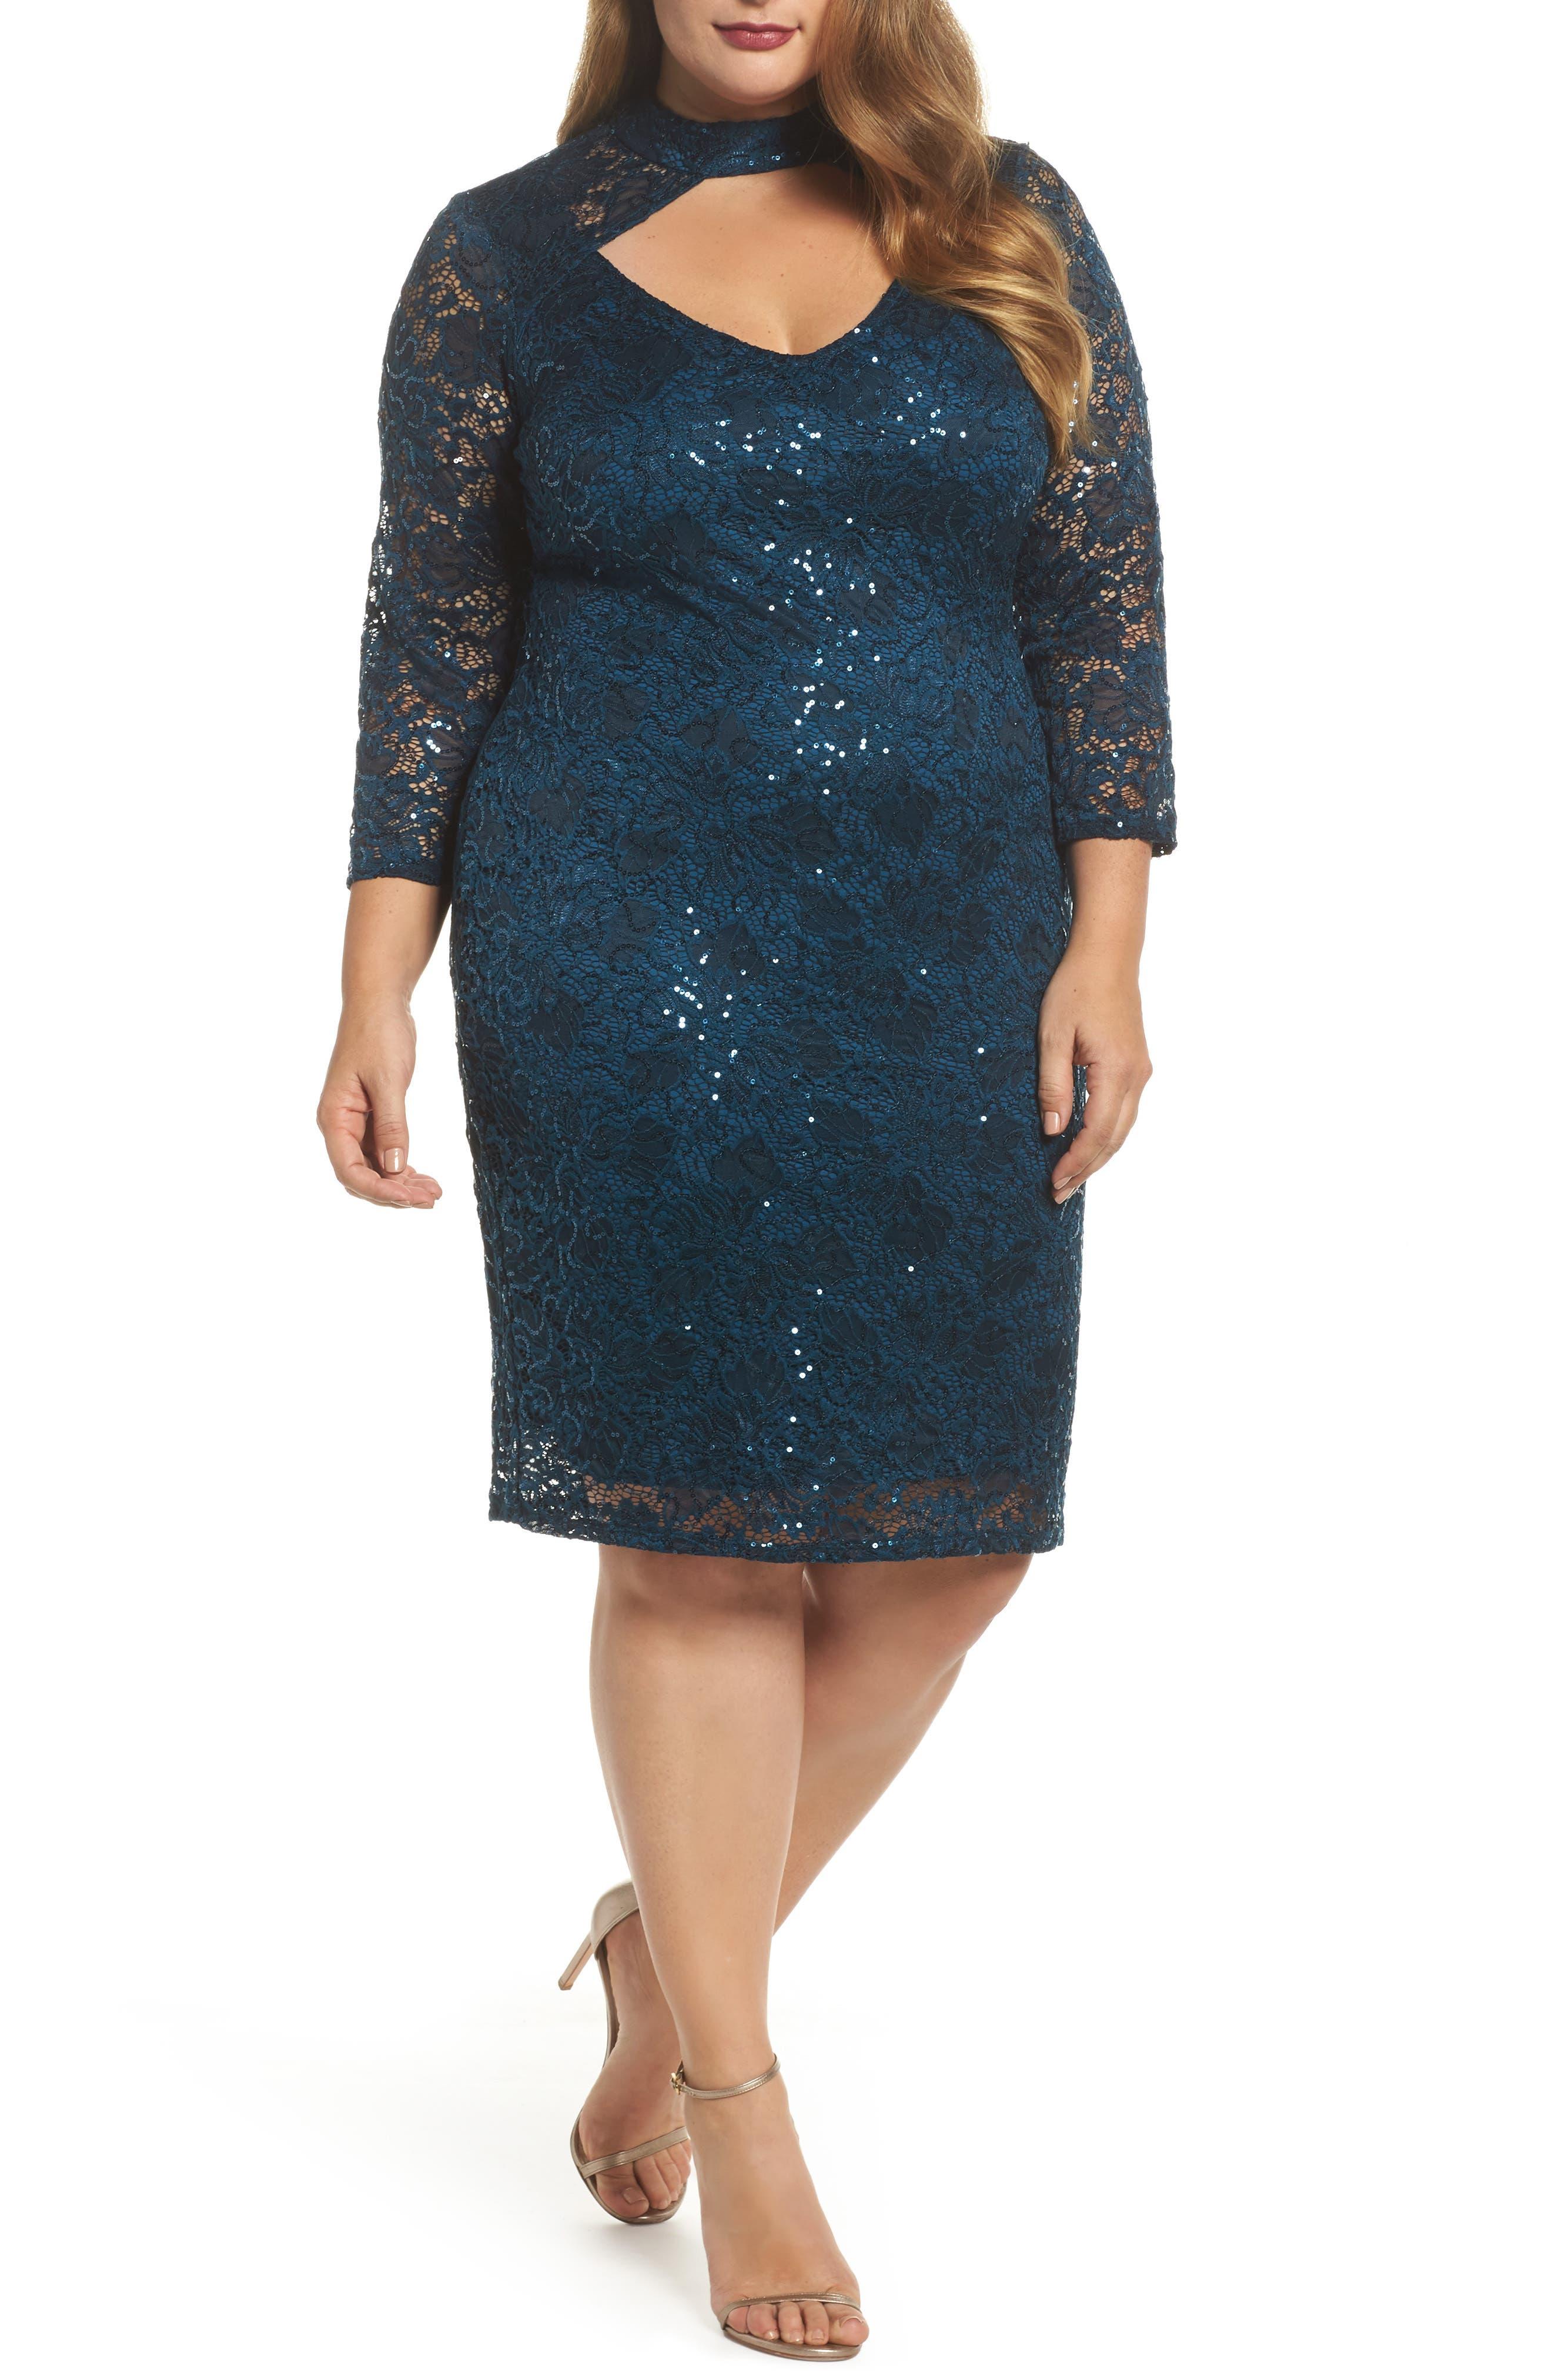 Alternate Image 1 Selected - Marina Choker Neck Lace Sheath Dress (Plus Size)